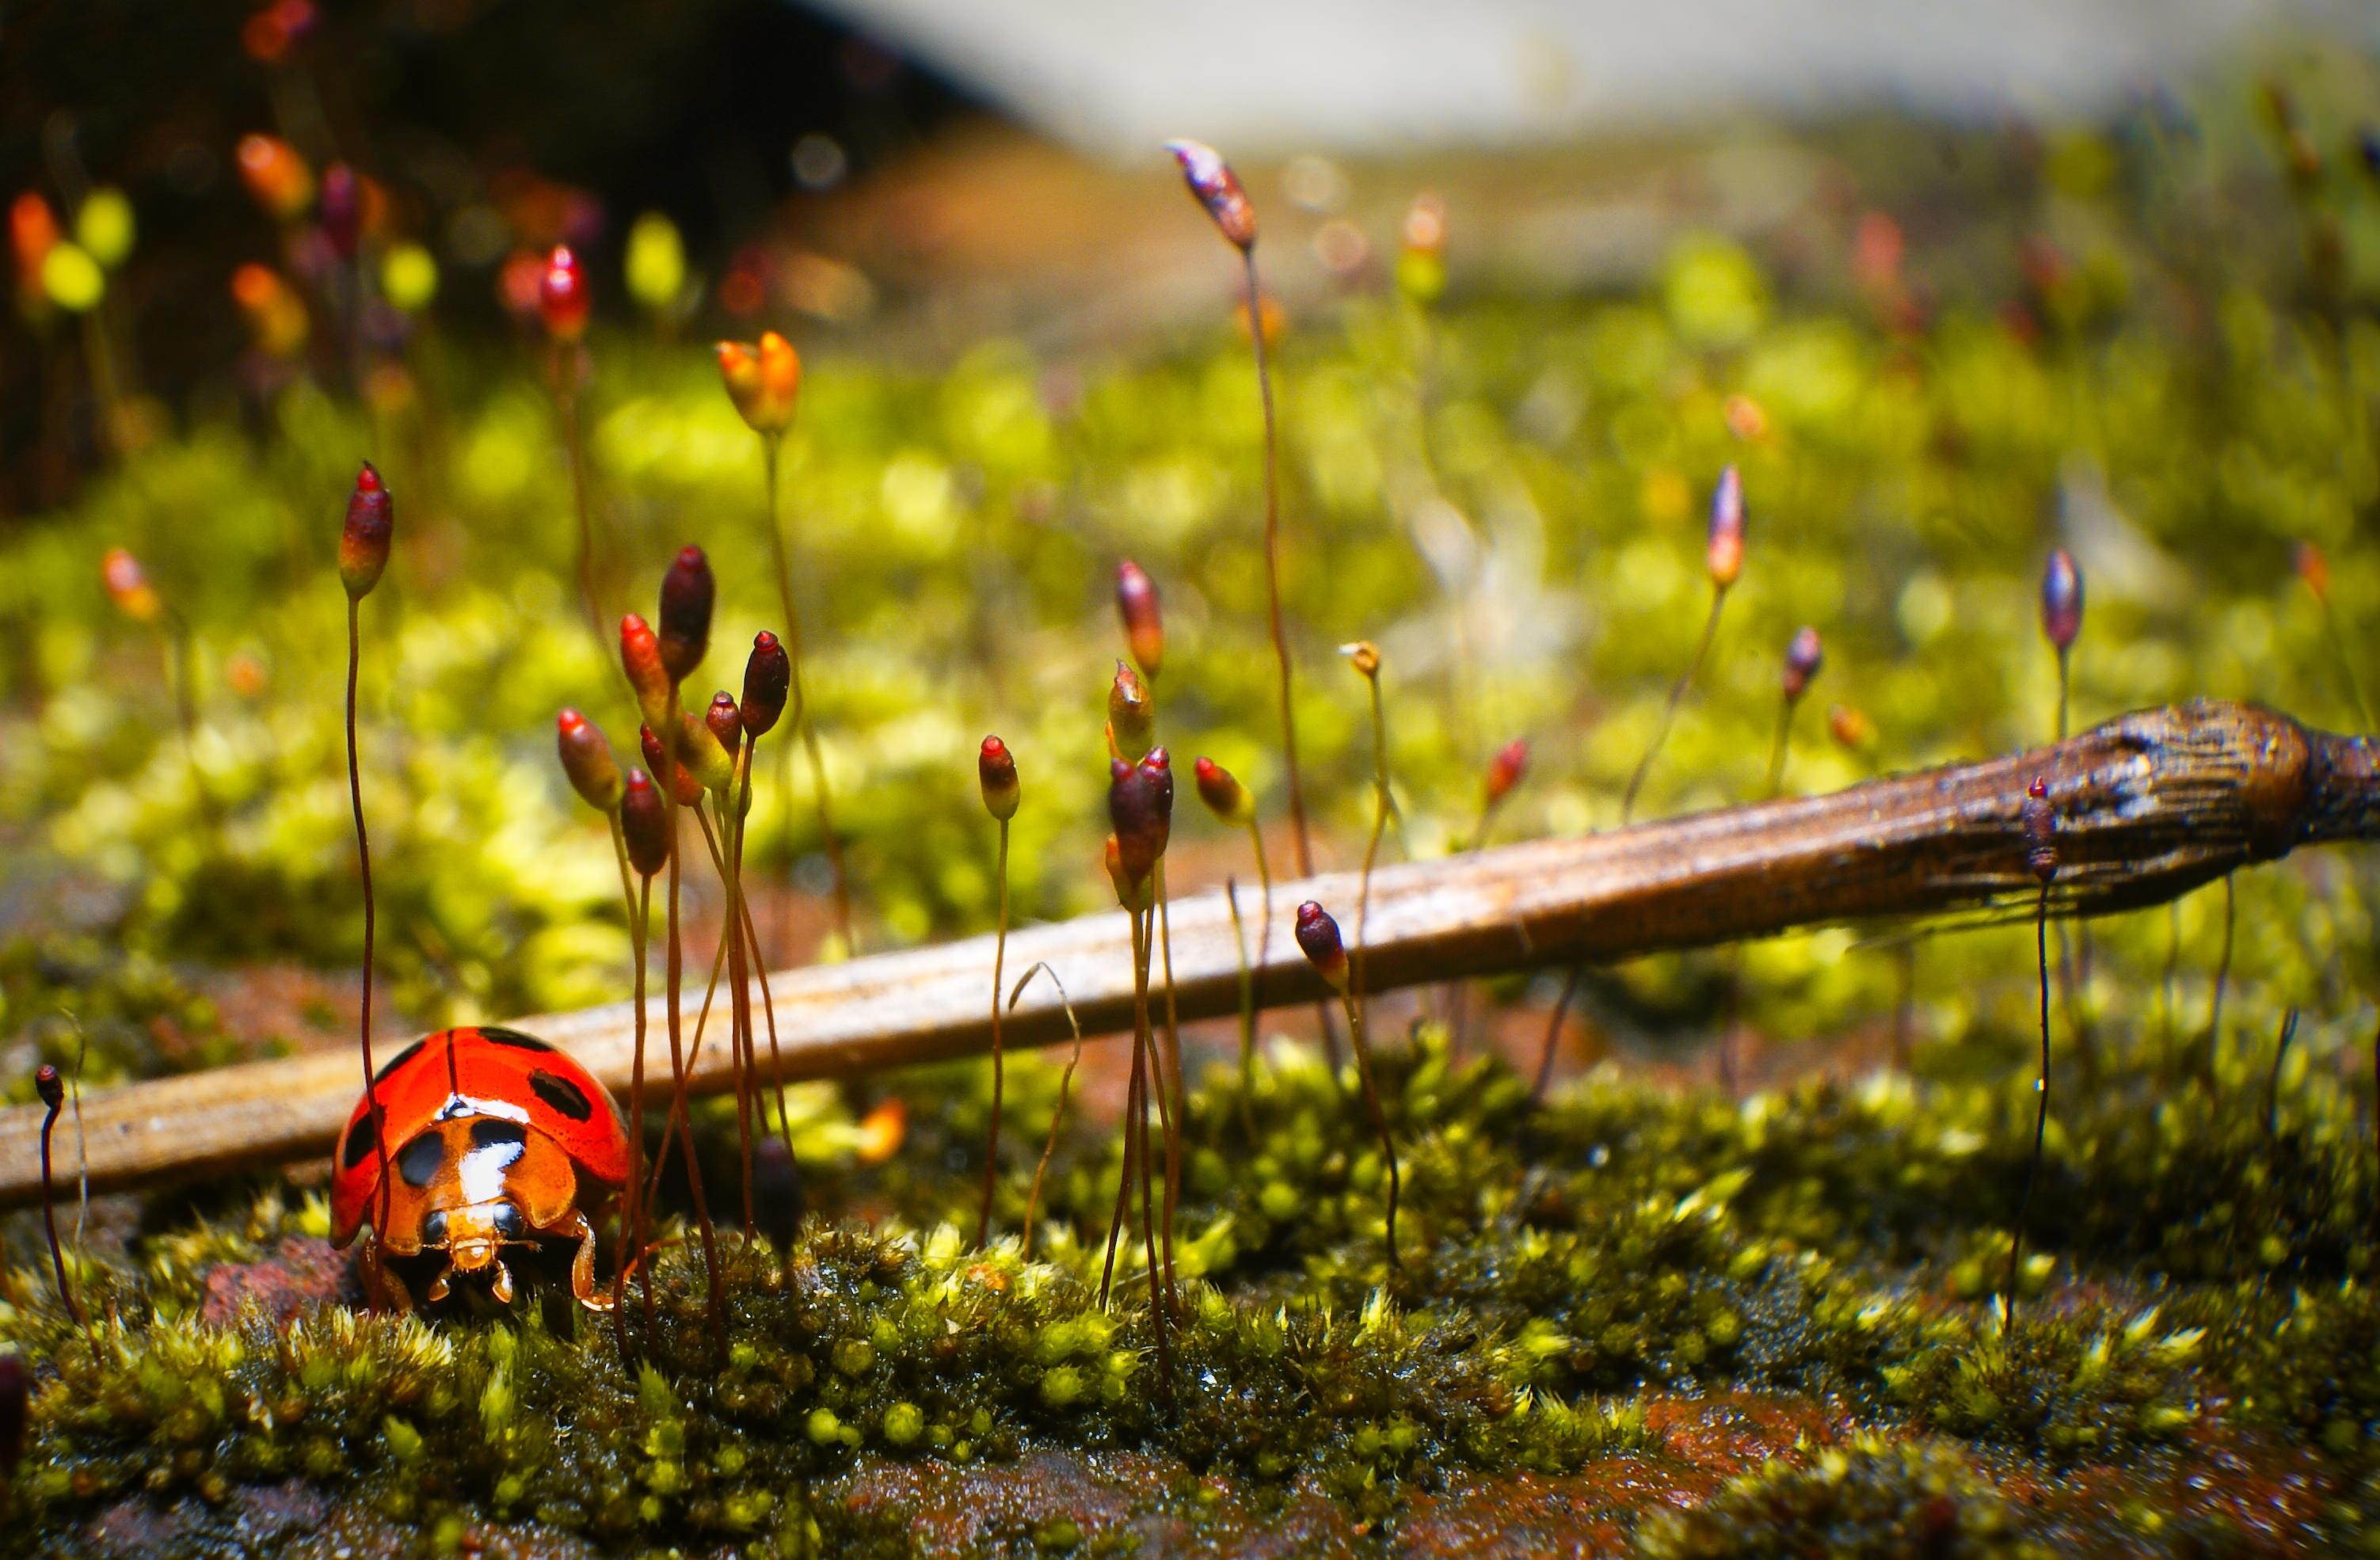 Extraordinary Ladybug Wallpaper